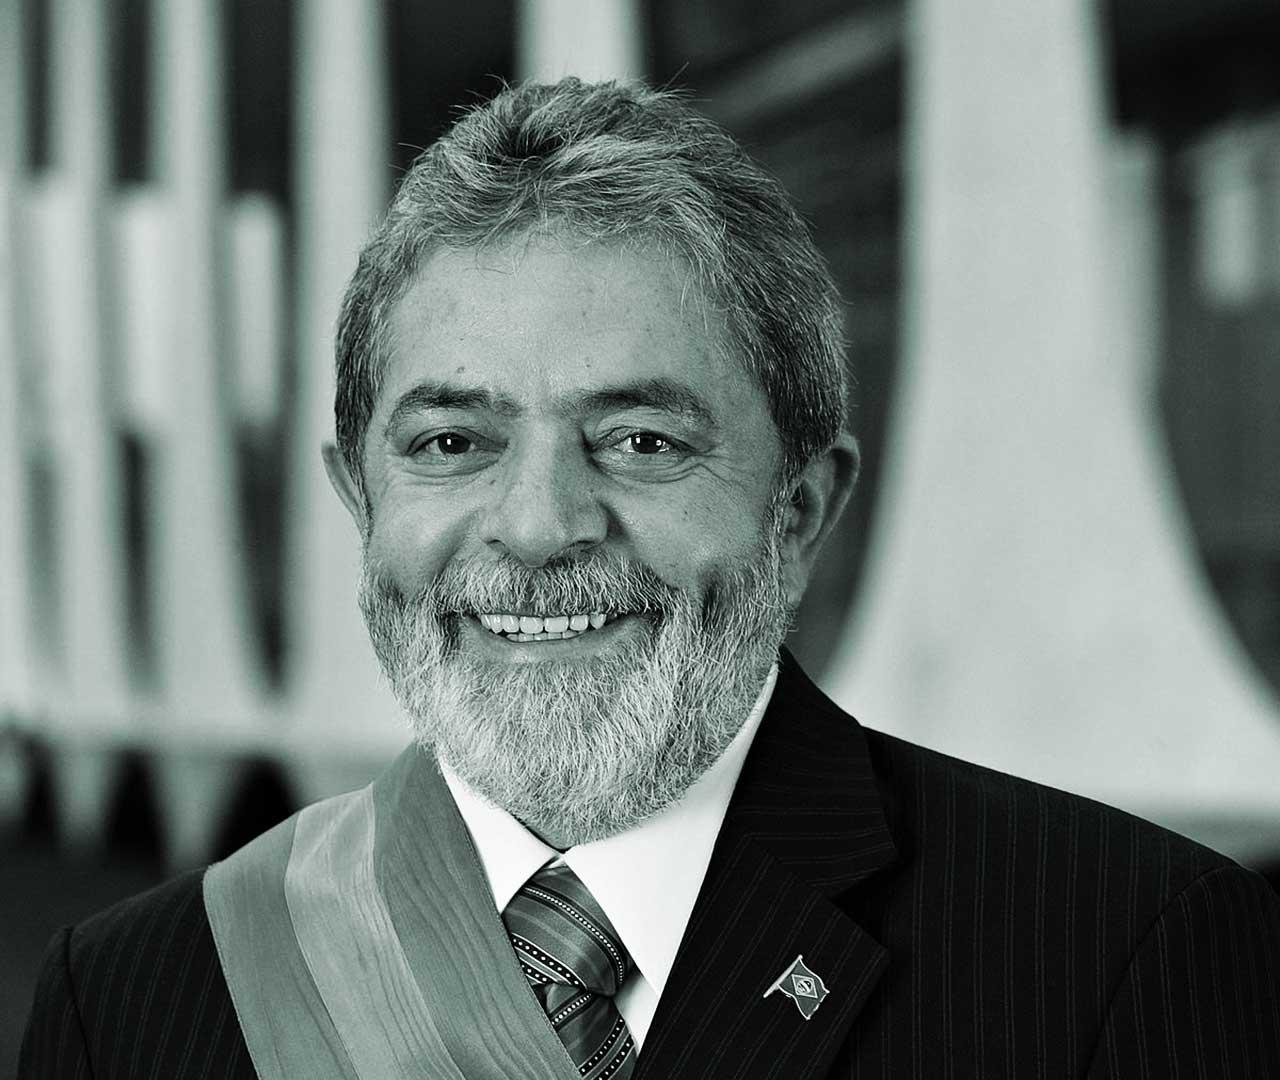 Brasil's truncated Democracy – a work in progress